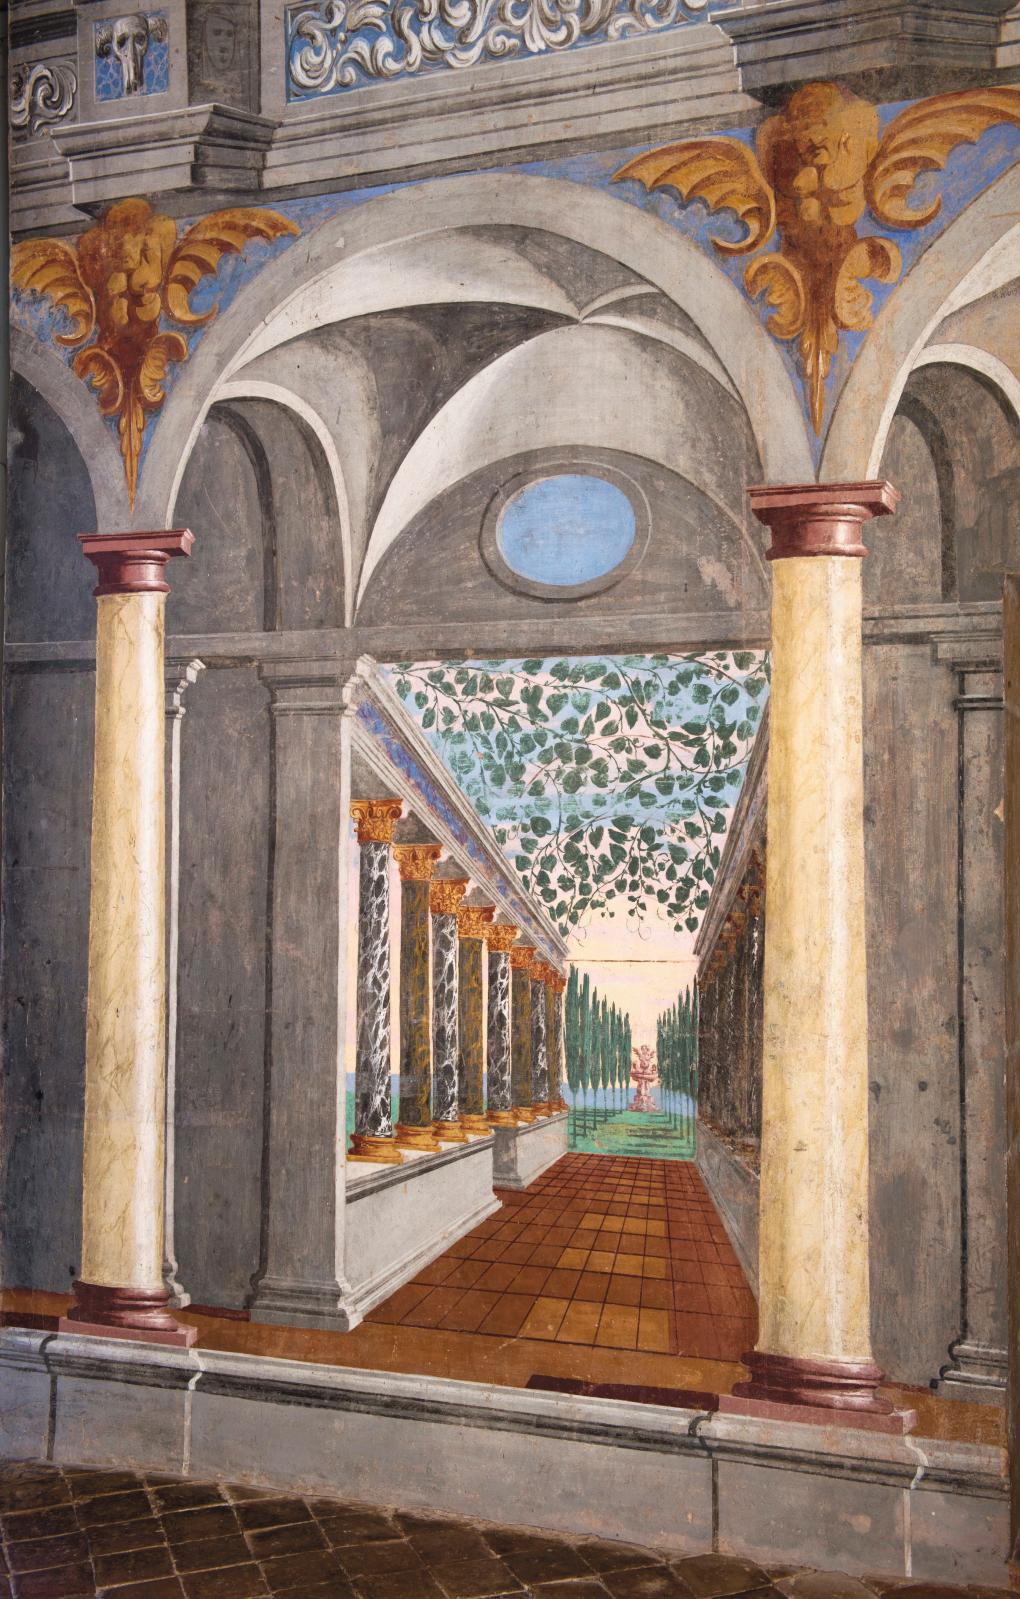 Pietro Ricchi, Salle des Perspectives, 1632 (detail).